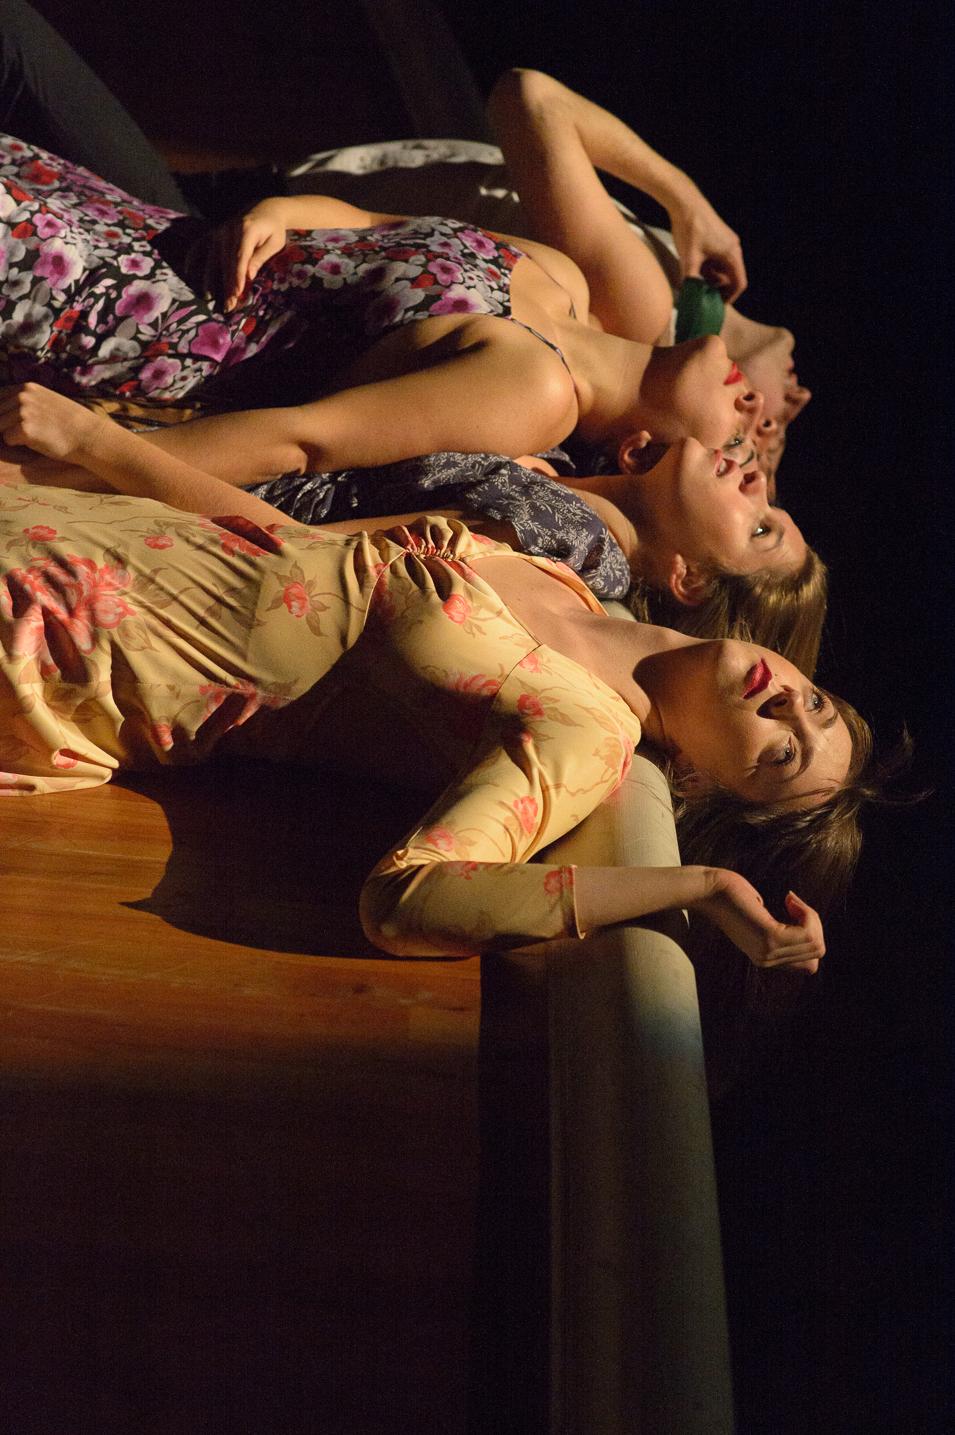 Emily Palmquist, Skye Van Rensselaer, Nadine Malouf, Clinton Edward- Photo: John Deamara